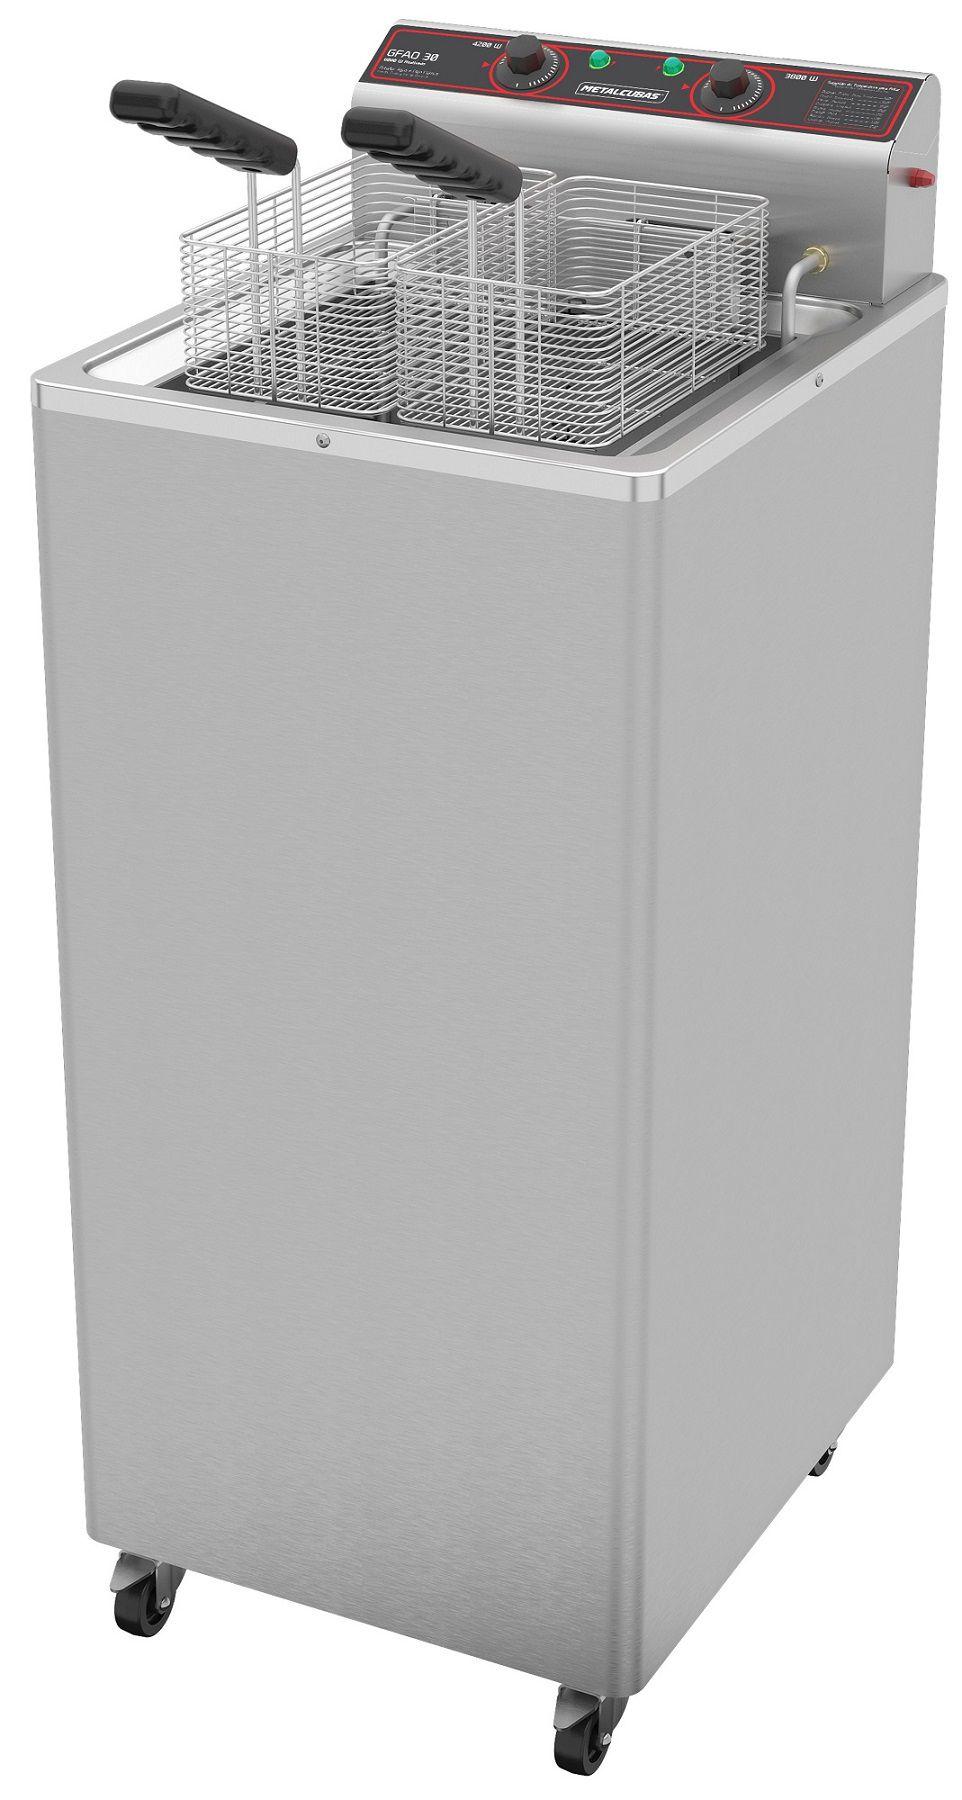 Fritadeira Industrial Elétrica 30 Litros Metalcubas 8000W - GFAO 30 P  - Carmel Equipamentos